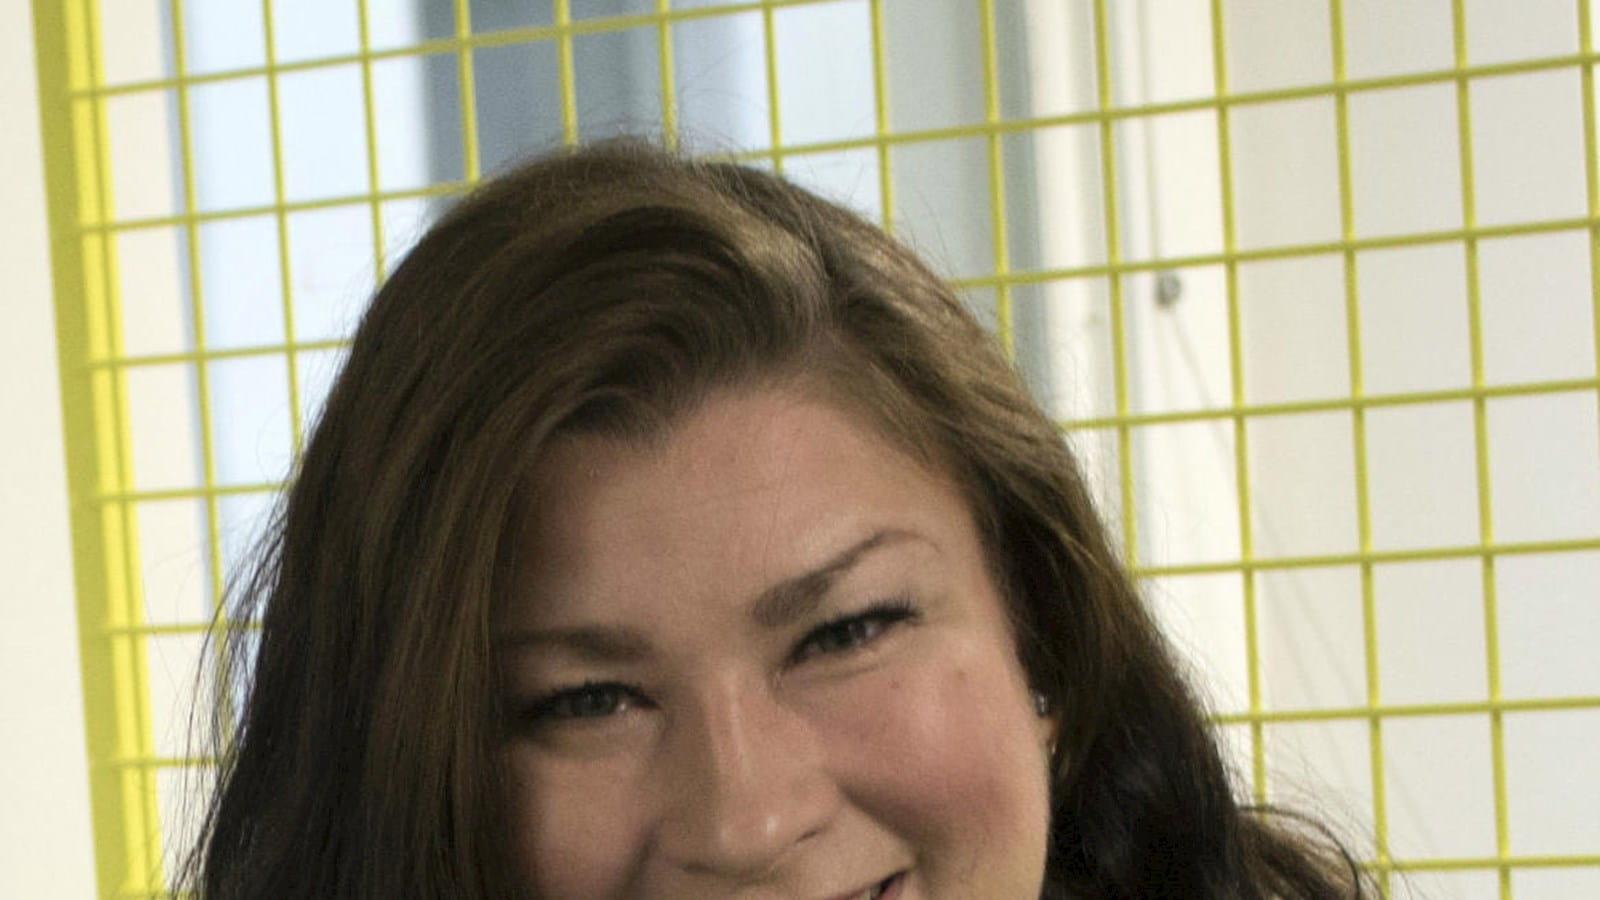 Heli Ruotsalainen,  Head of Social Media, Dentsu Aegis Network